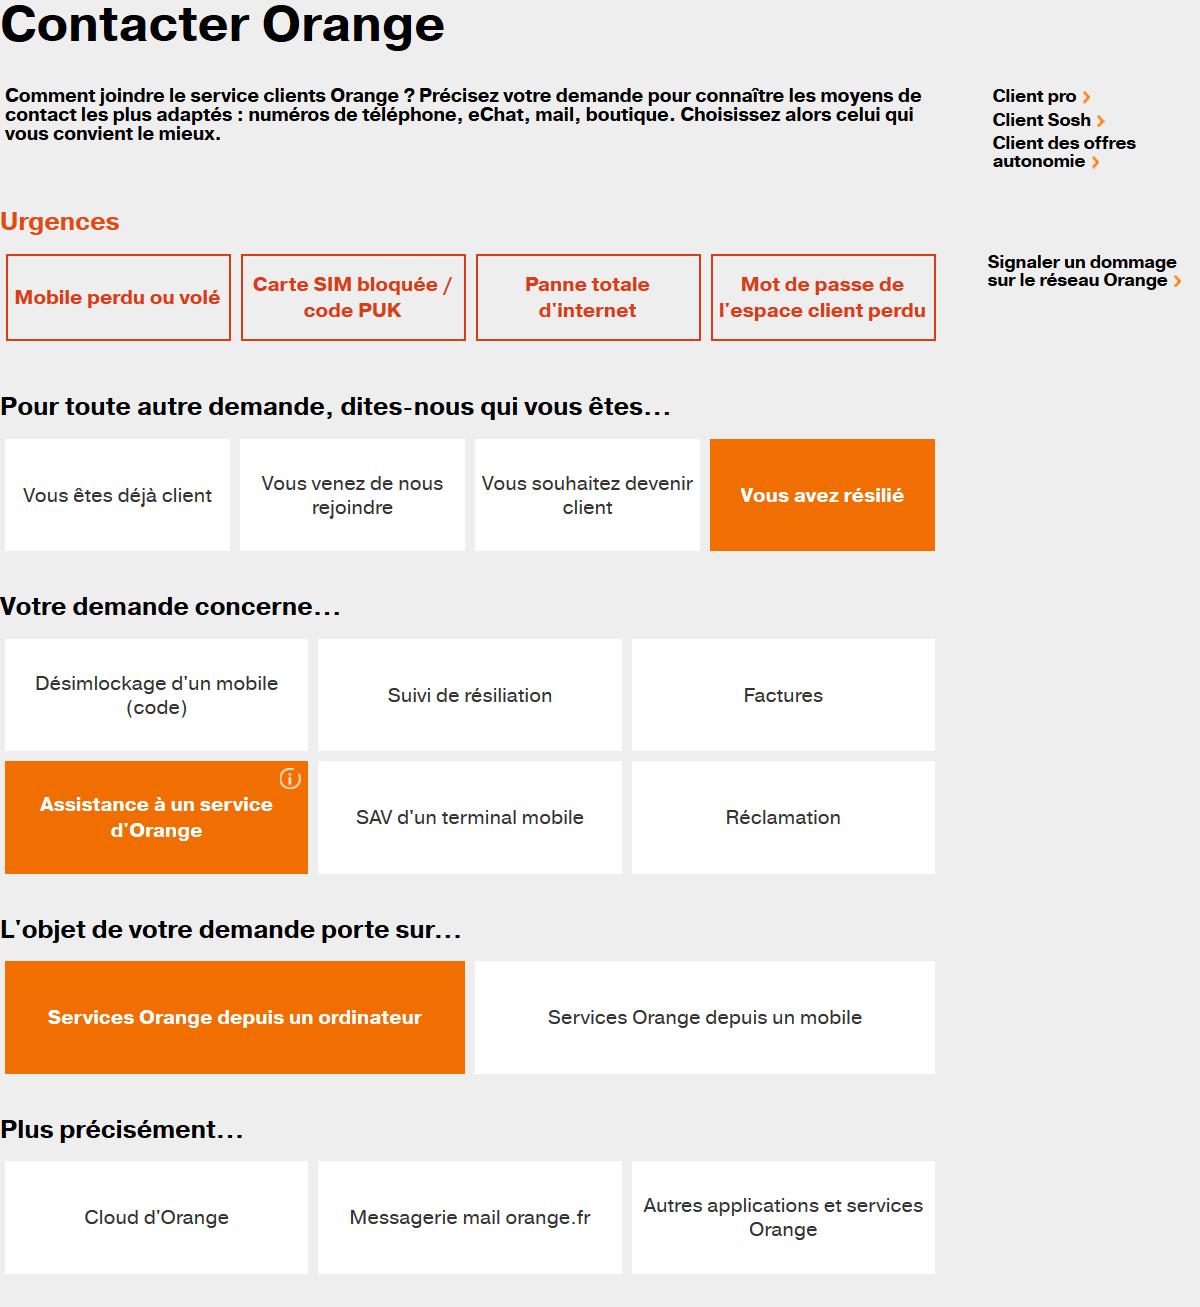 Screenshot_2018-09-10 Contacter le service clients Orange.png